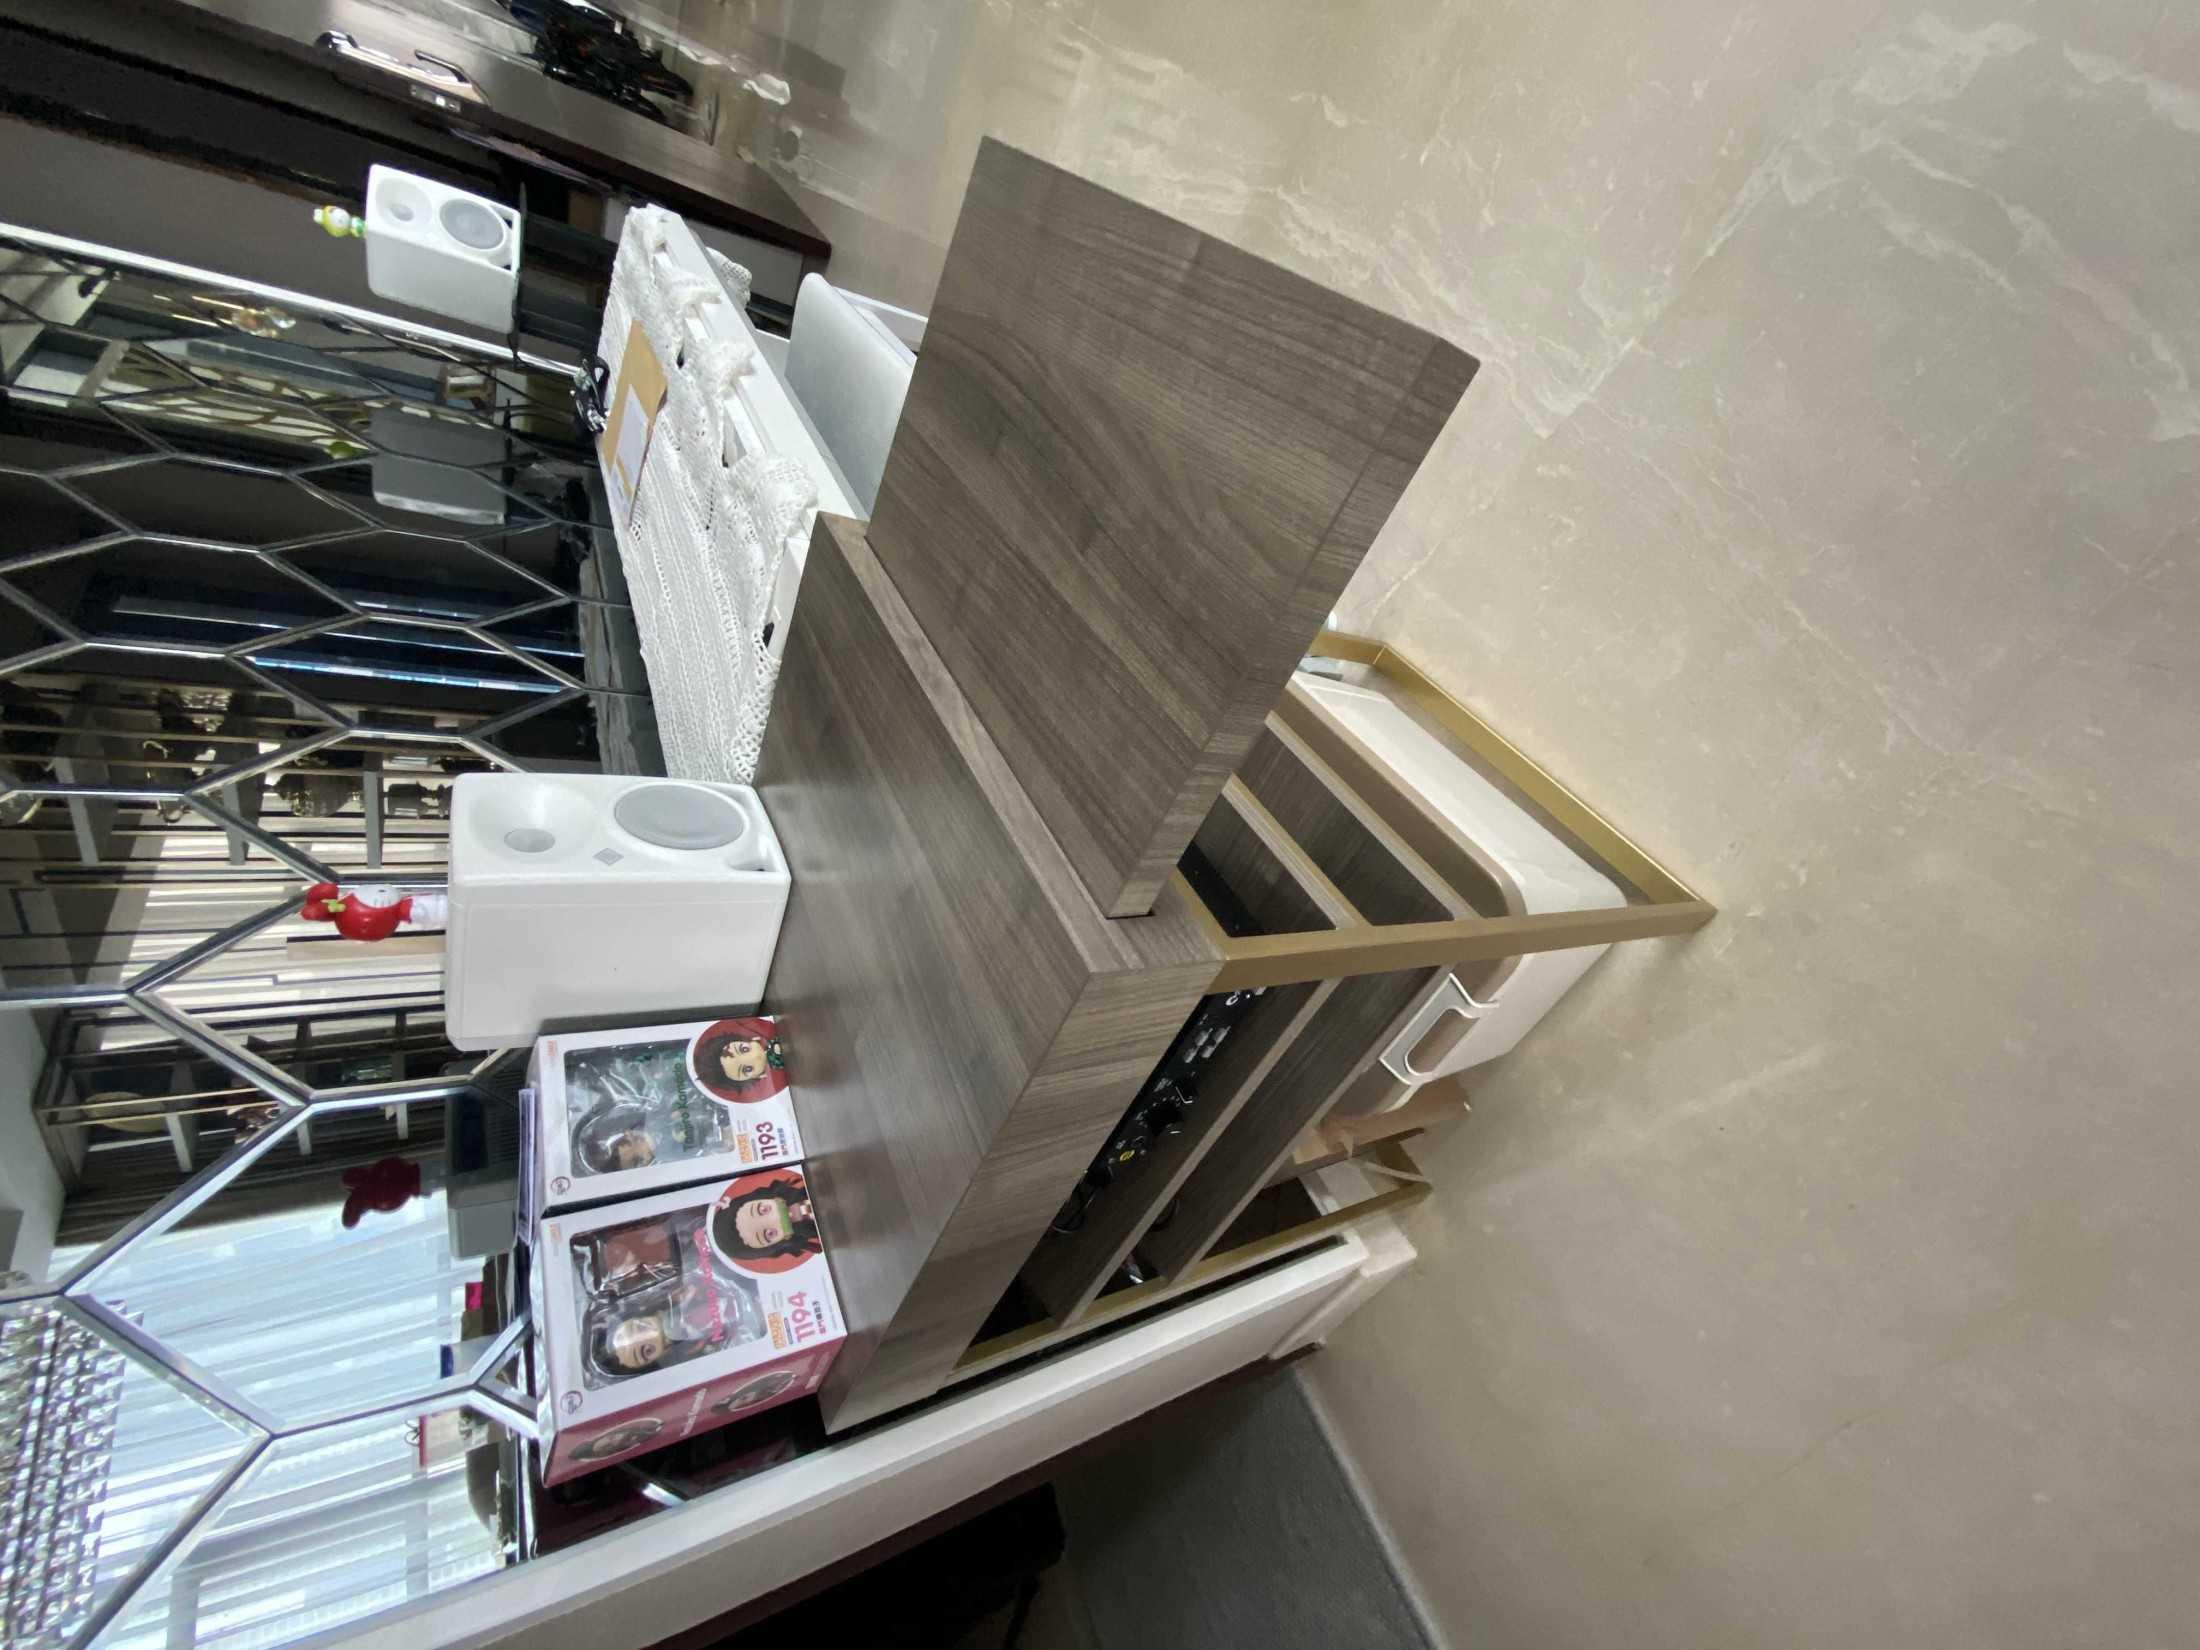 Jordi Samuel Custom Furniture Jakarta Selatan, Kota Jakarta Selatan, Daerah Khusus Ibukota Jakarta, Indonesia Jakarta Selatan, Kota Jakarta Selatan, Daerah Khusus Ibukota Jakarta, Indonesia Jordi-Samuel-Custom-Furniture  115356